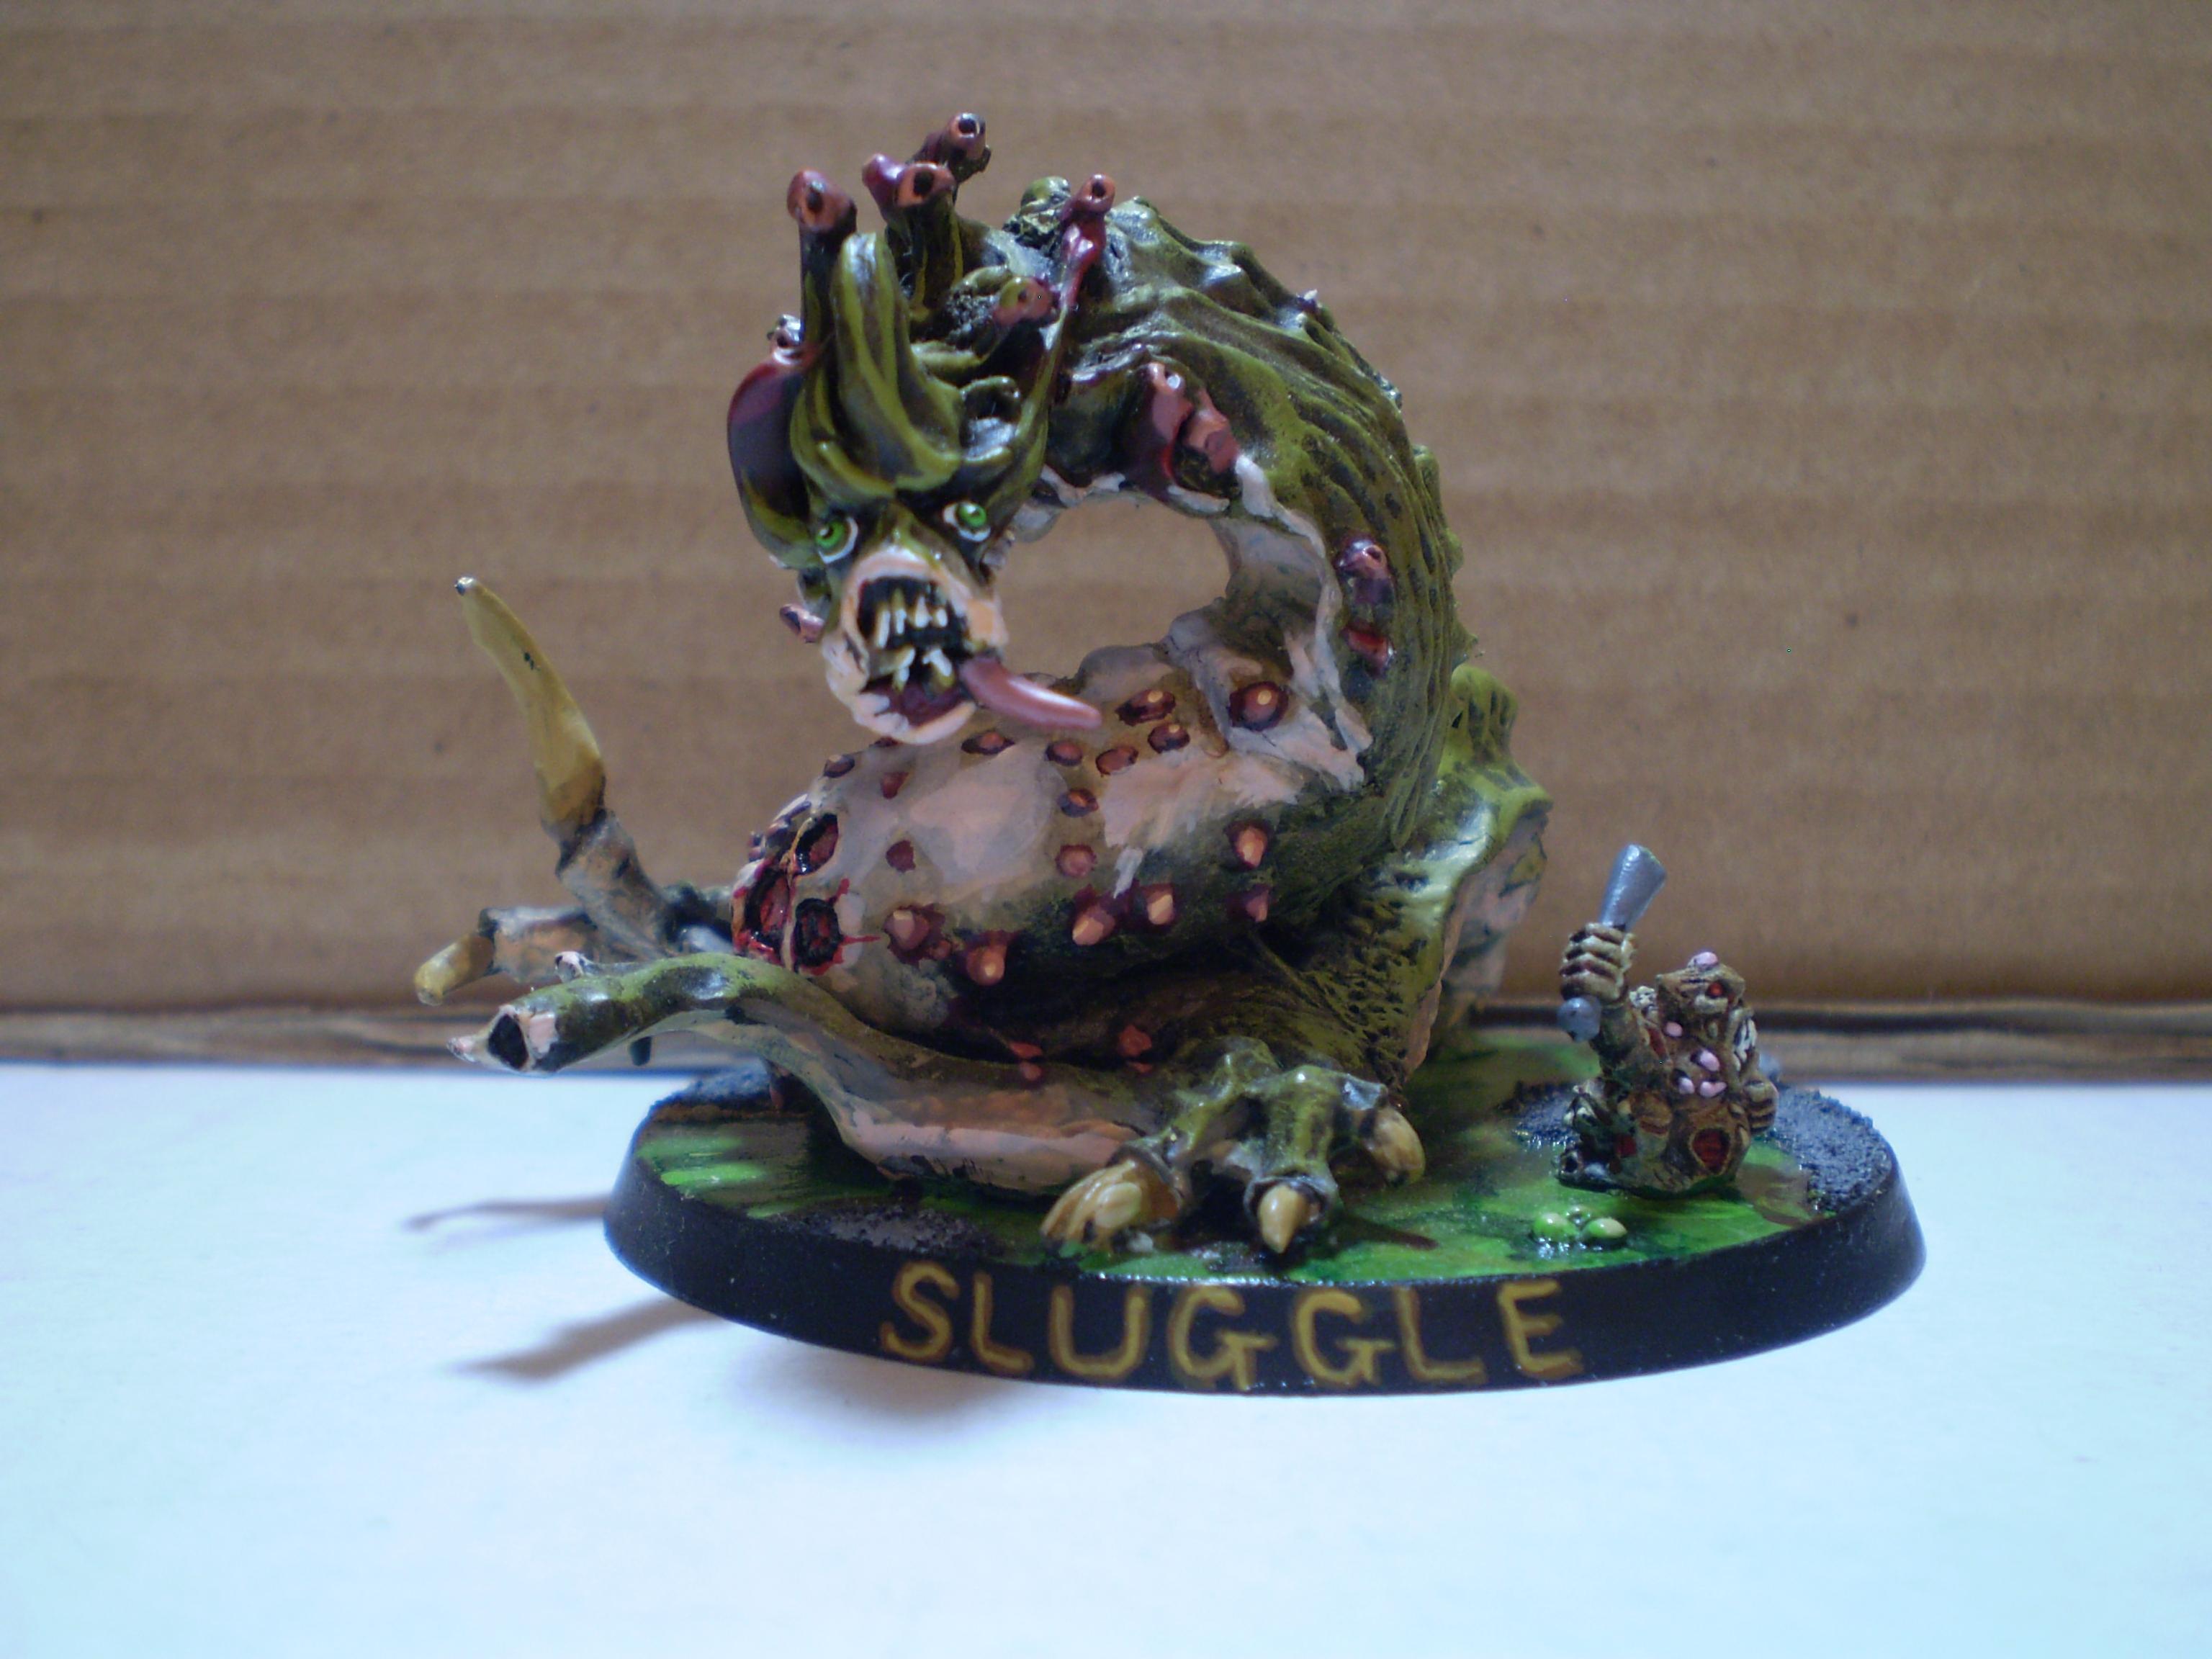 Daemons, Nurgle, Sluggle